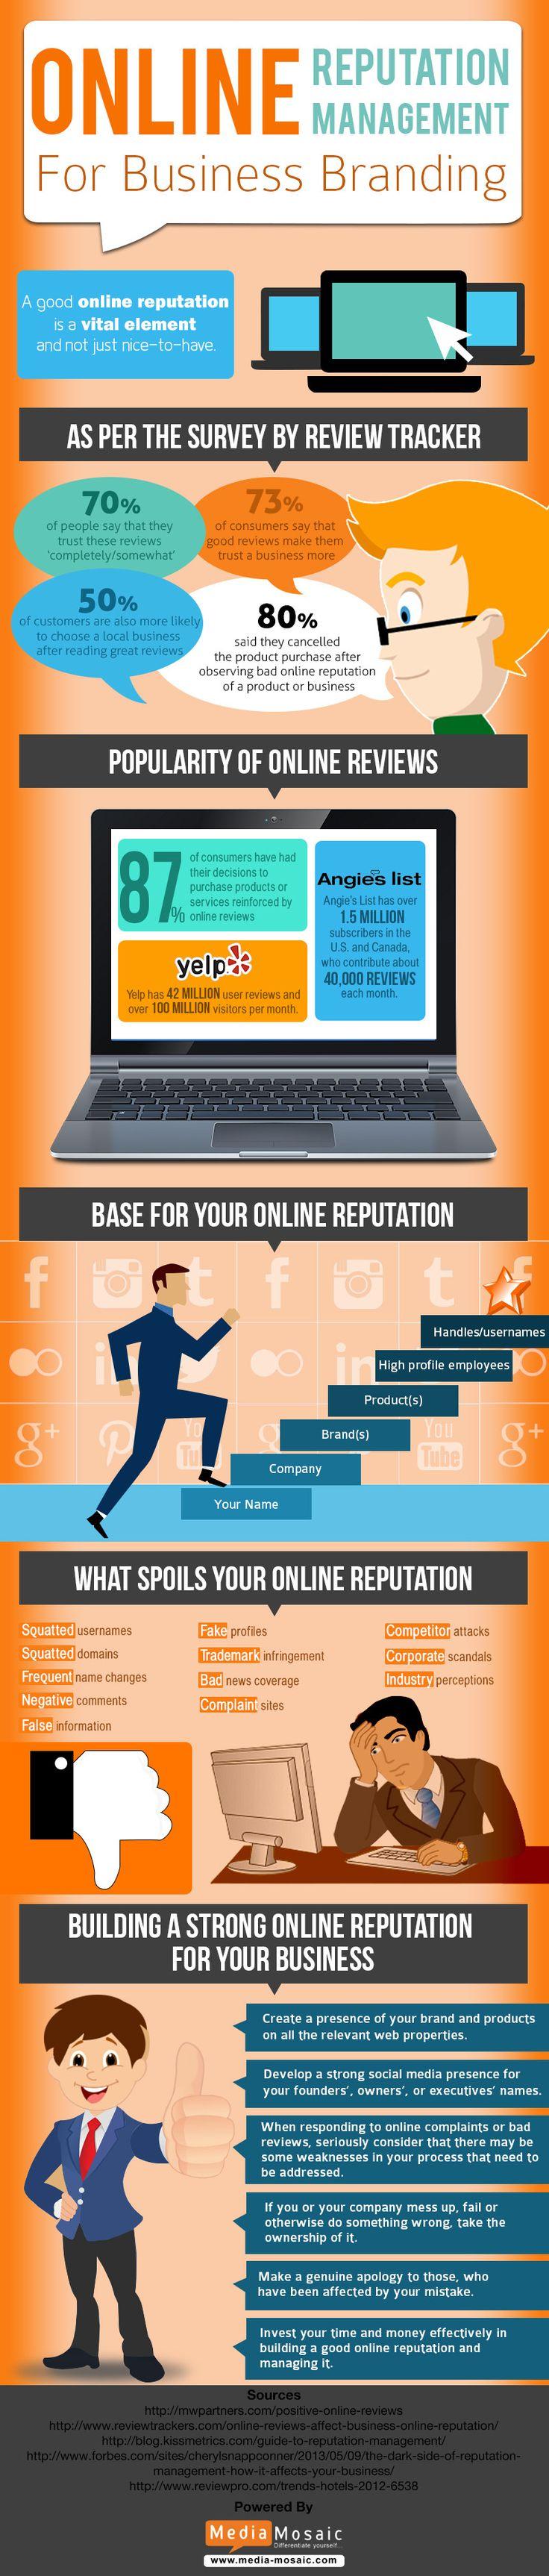 Online Reputation Management for Business Branding #infographic #Business #Branding